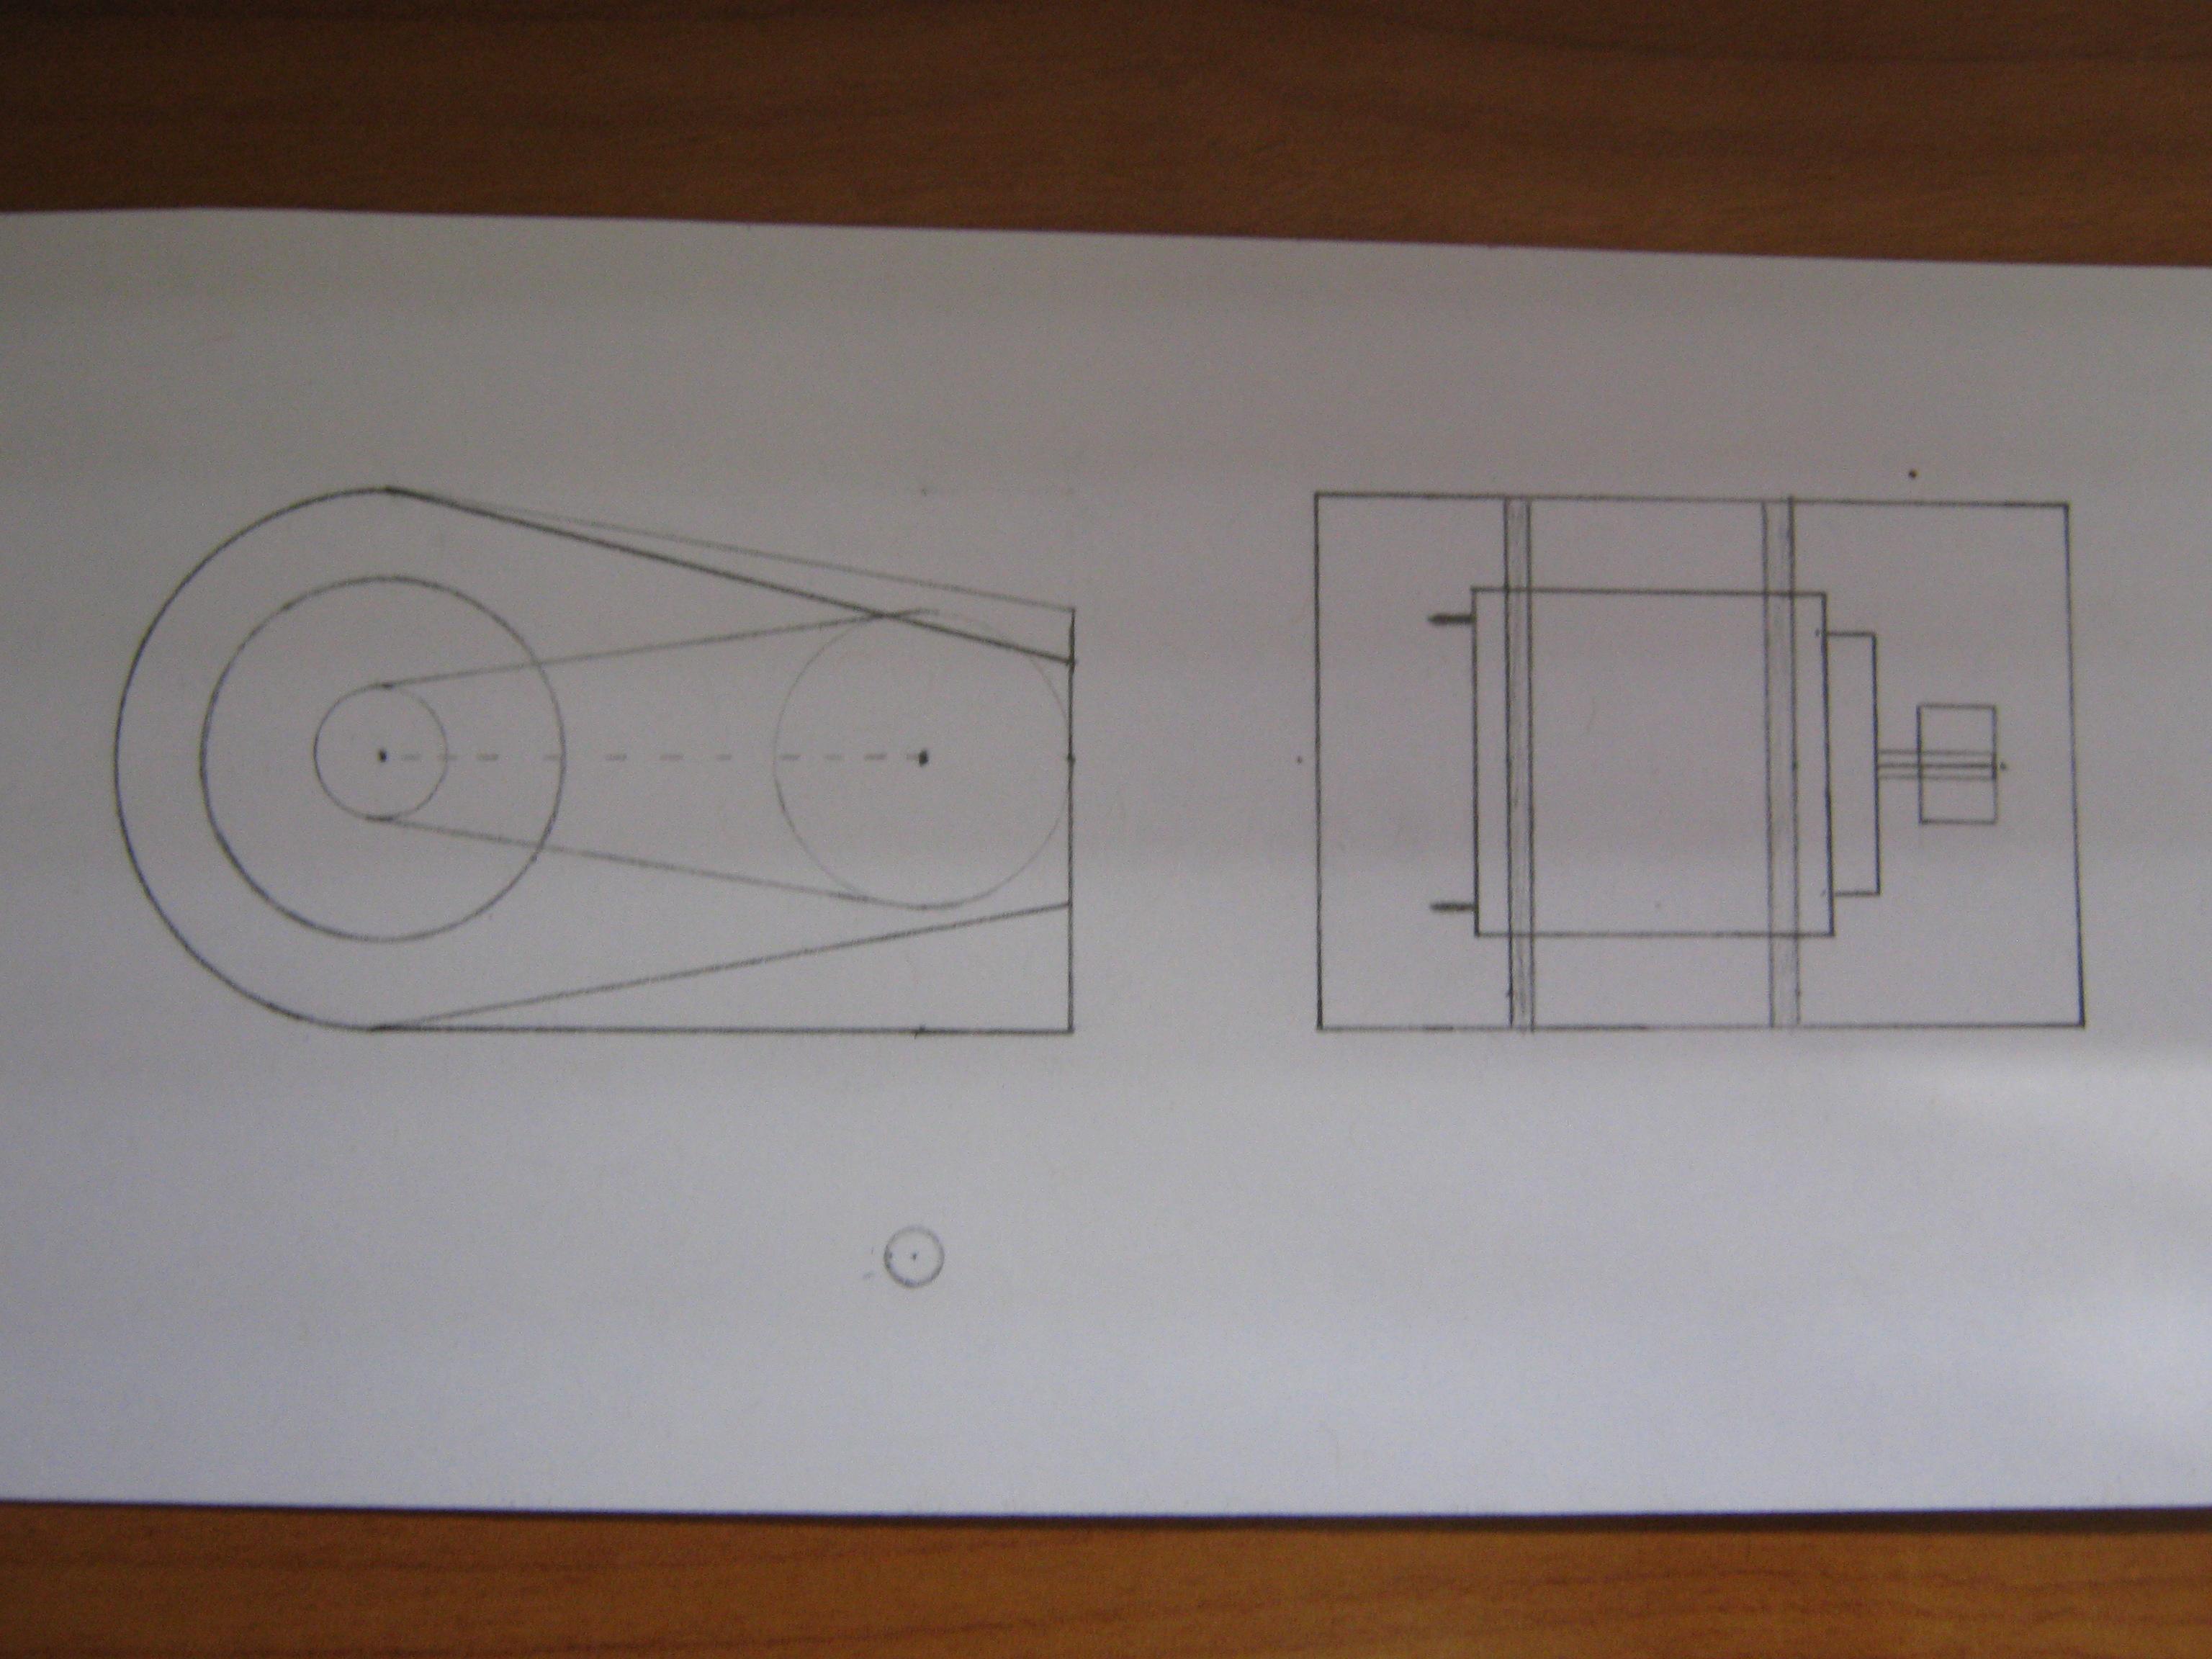 Picture of Motor: Design